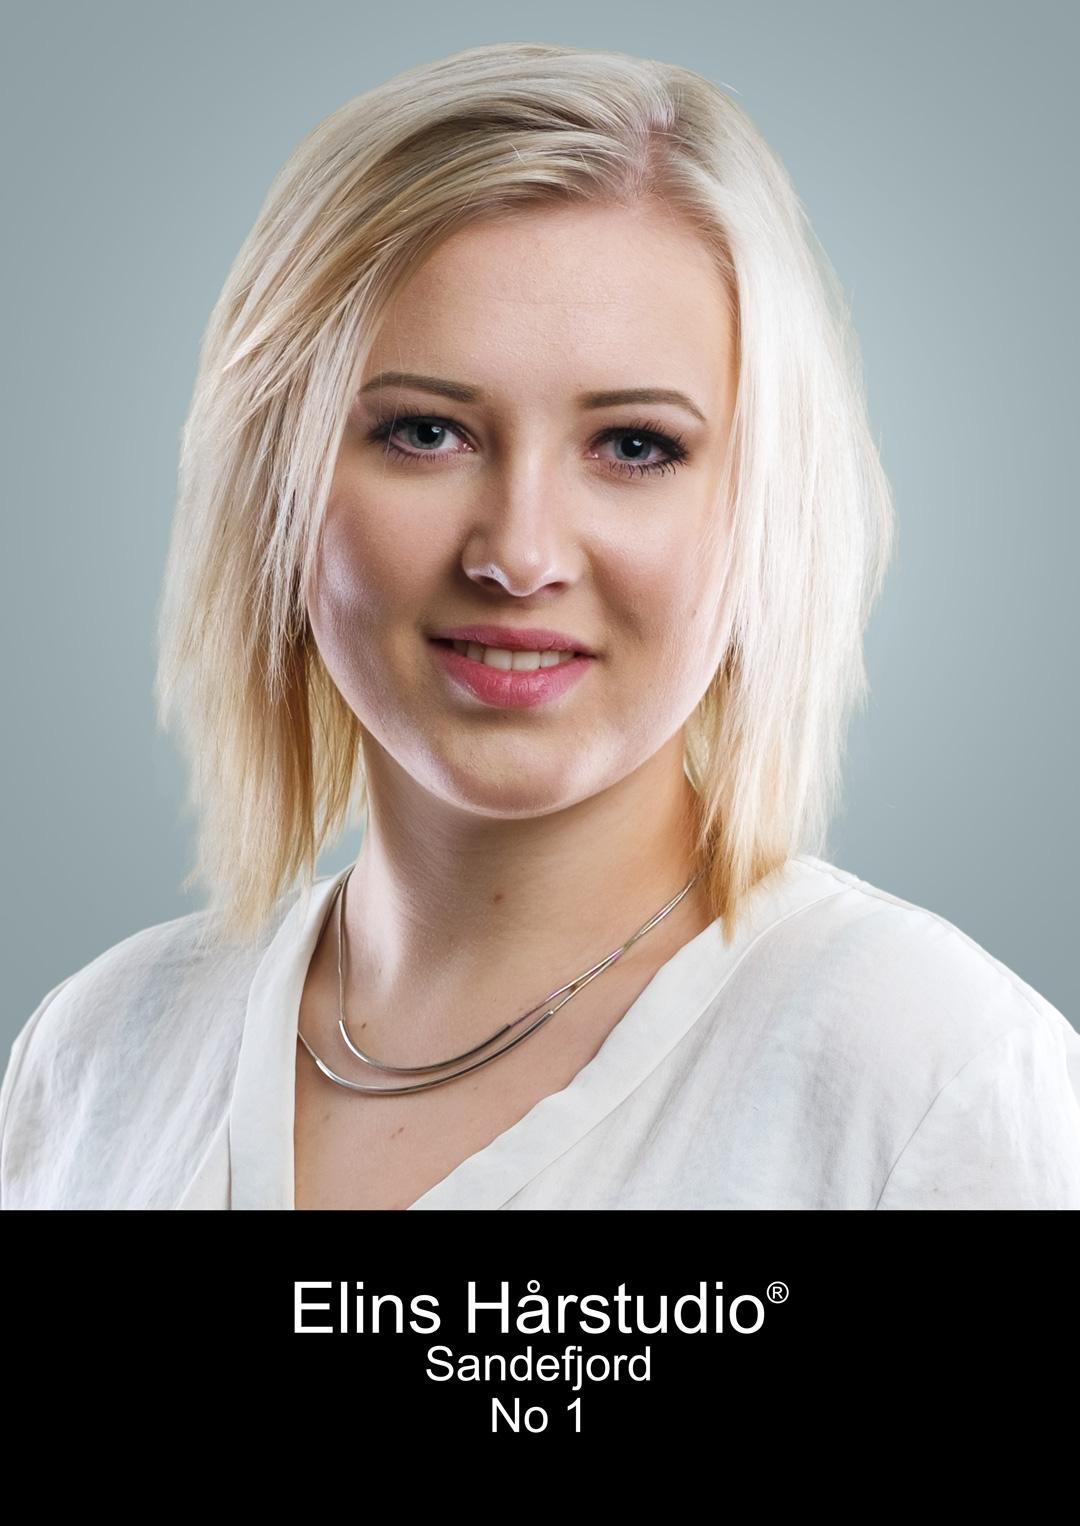 Frisør Kodal Andebu Silje Marie Westergren